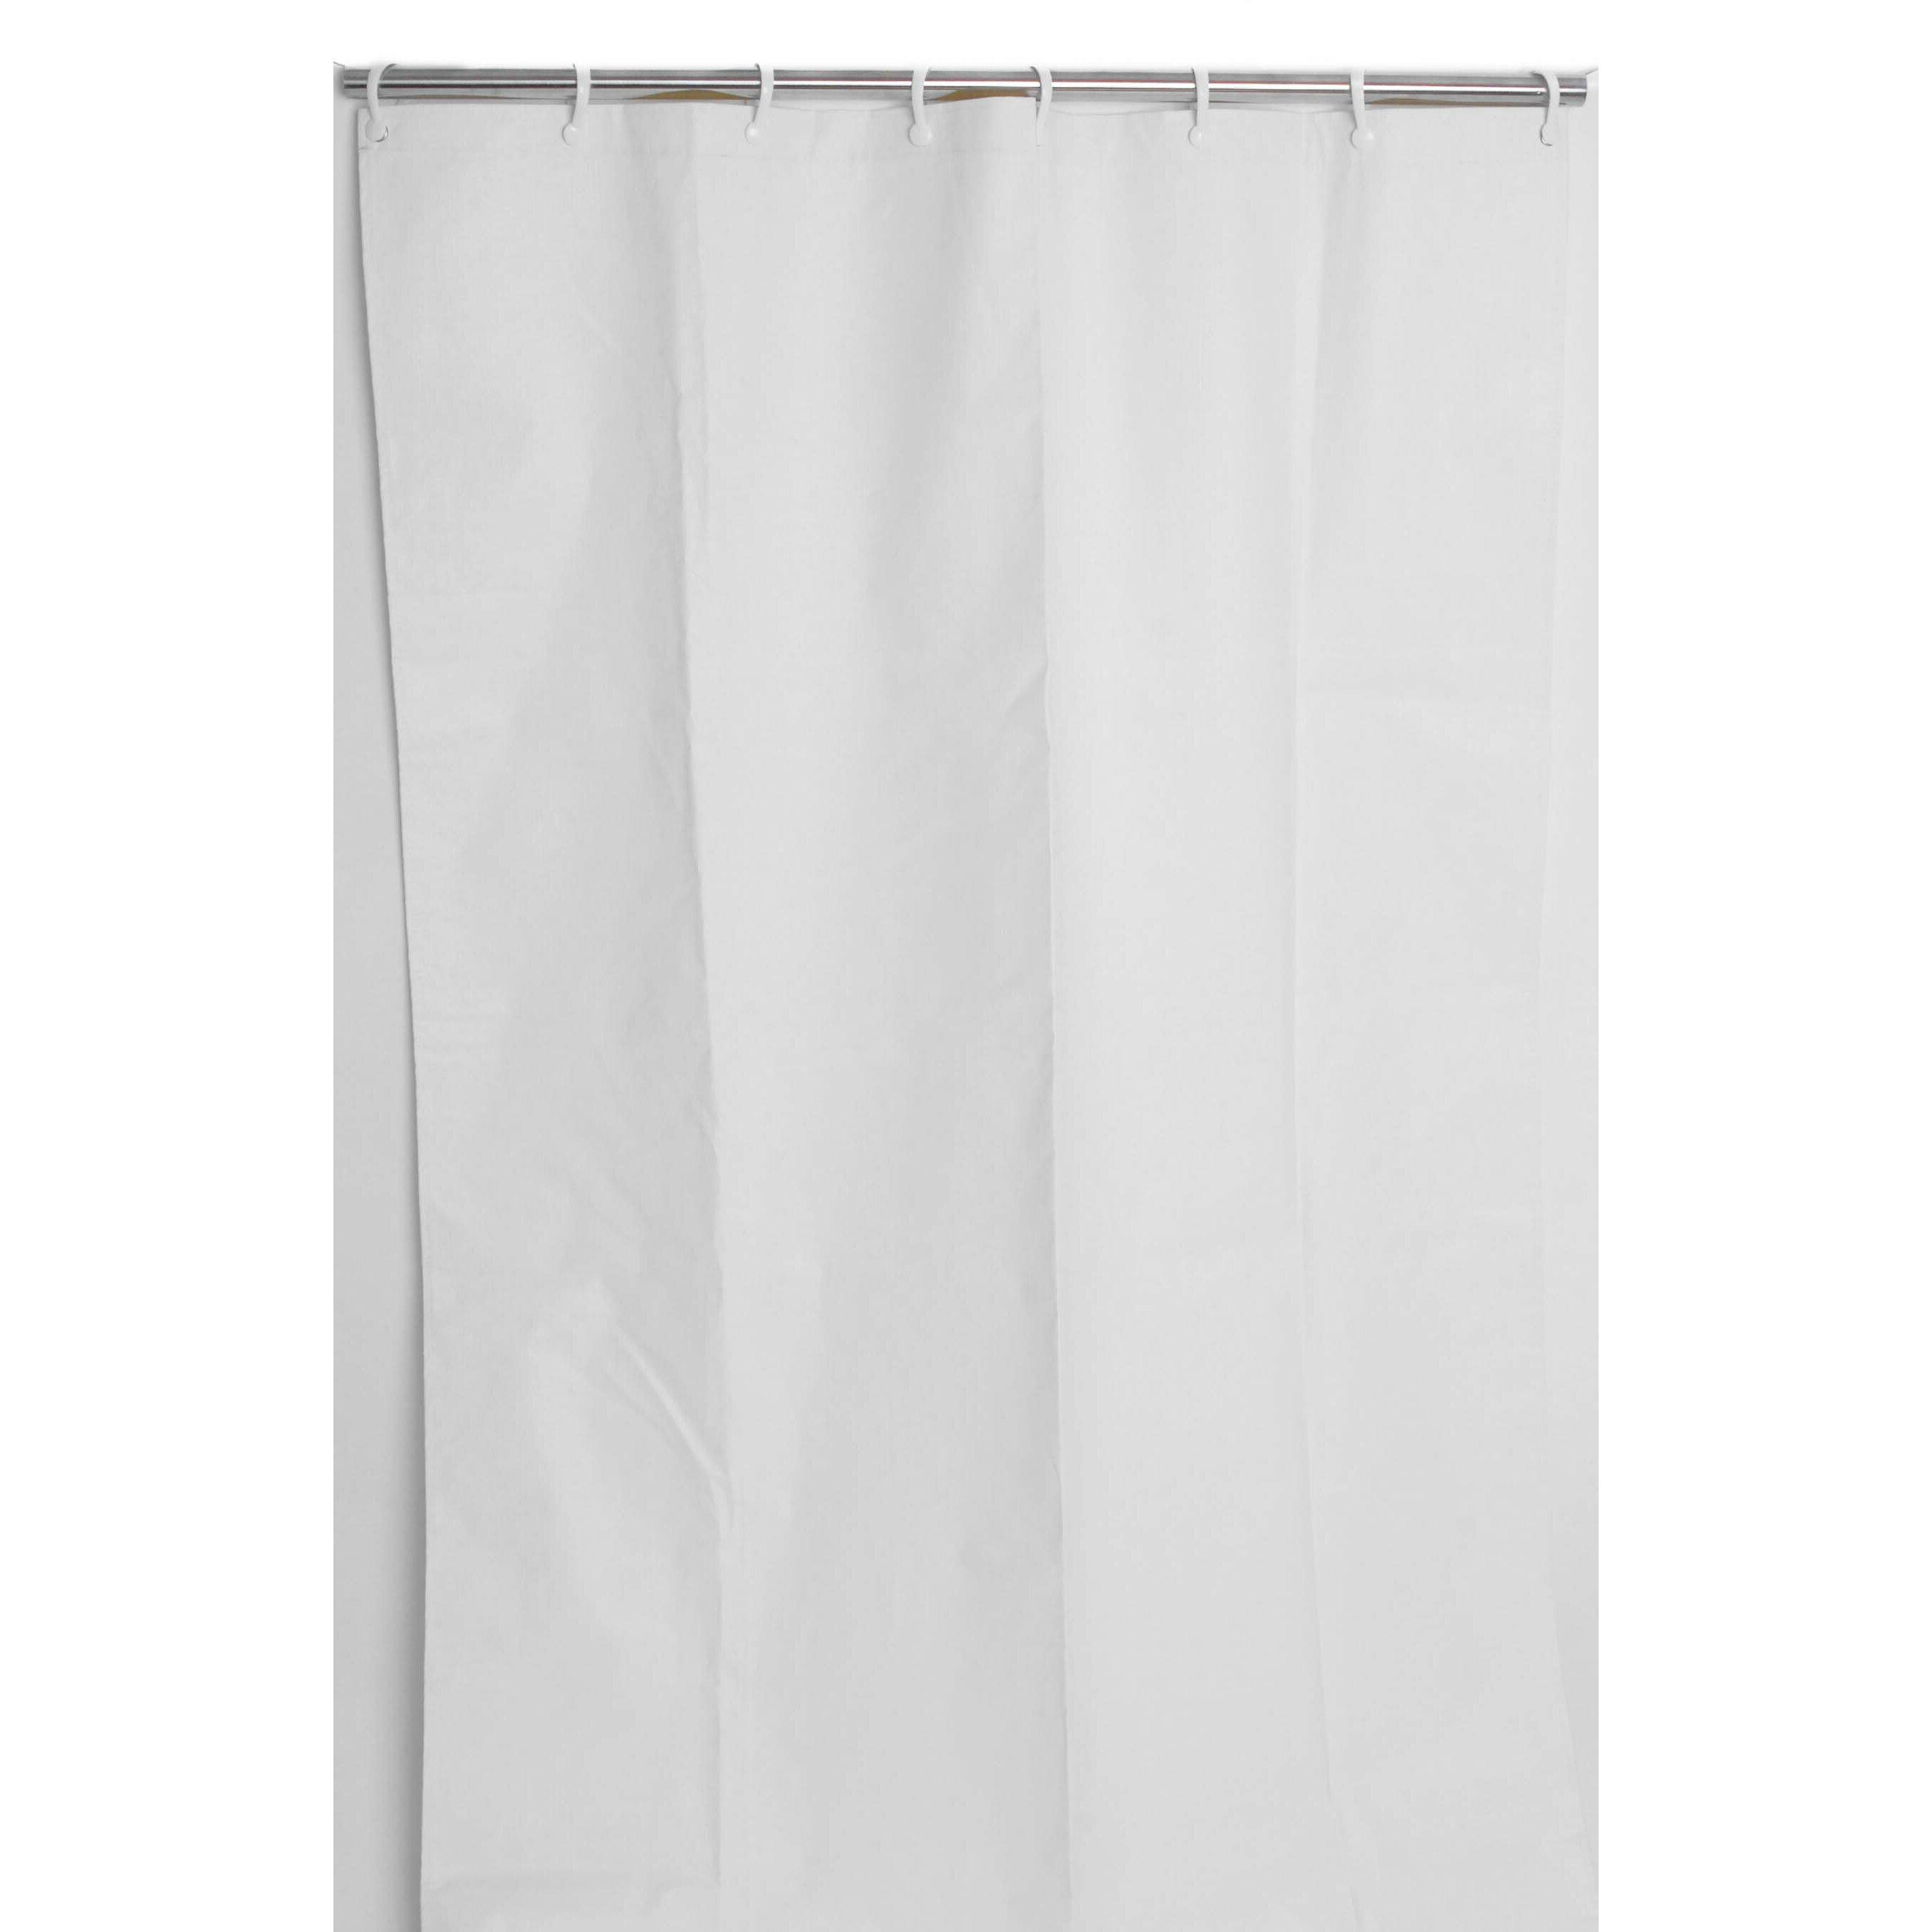 Csi Bathware Assure Vinyl Commercial Shower Curtain Wayfair